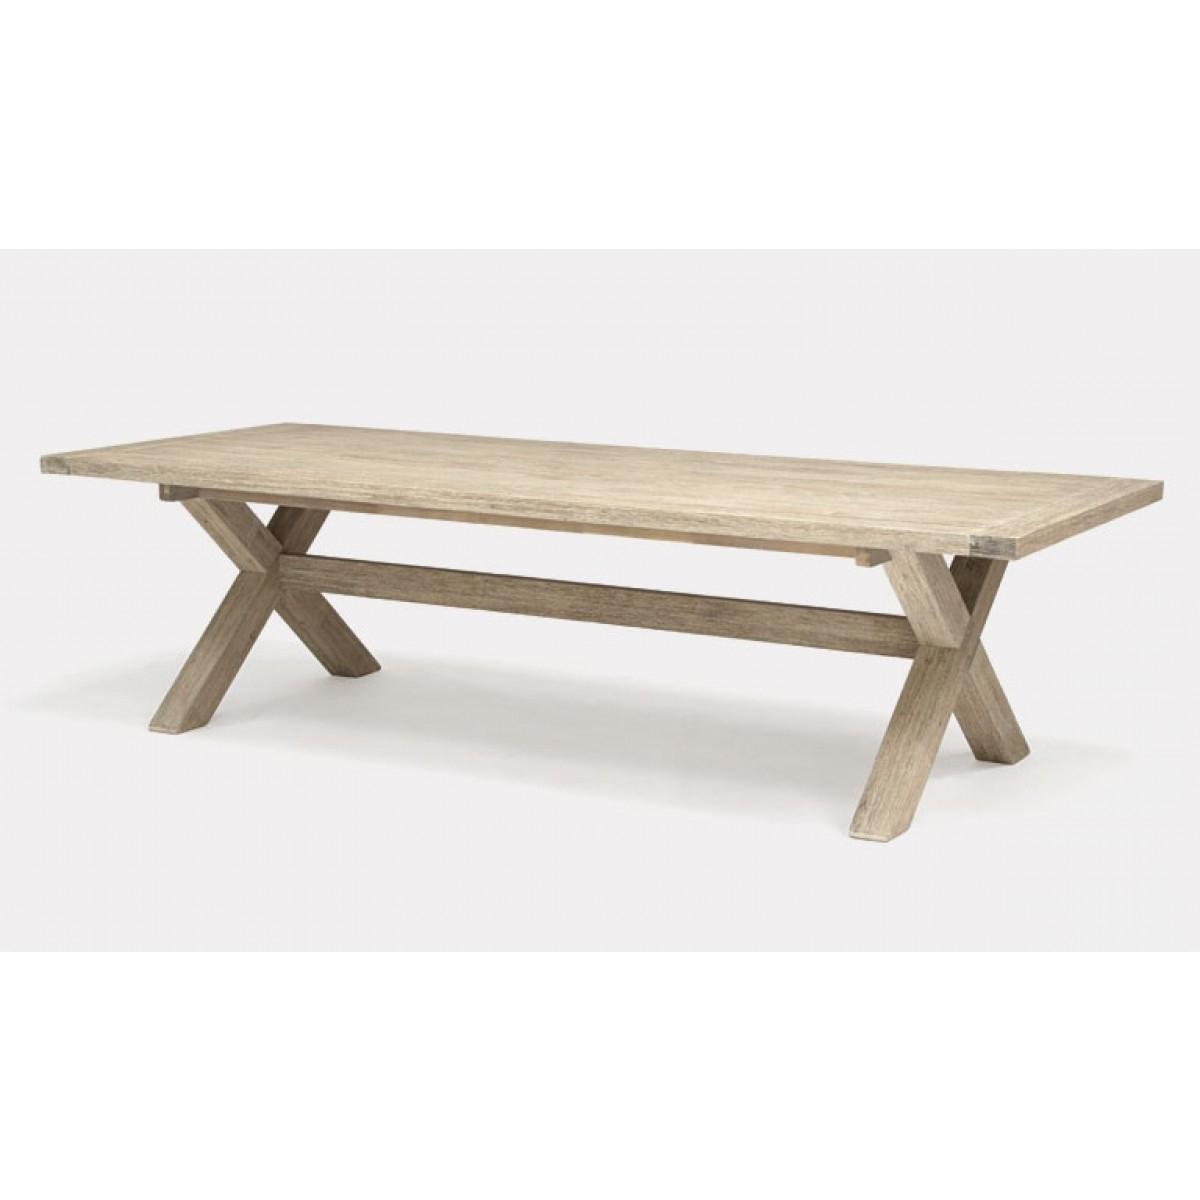 Cora Dining Tables Regarding Popular Kettler Cora Rectangular Dining Table 280 X 110 Cross Leg Best Price (View 4 of 25)